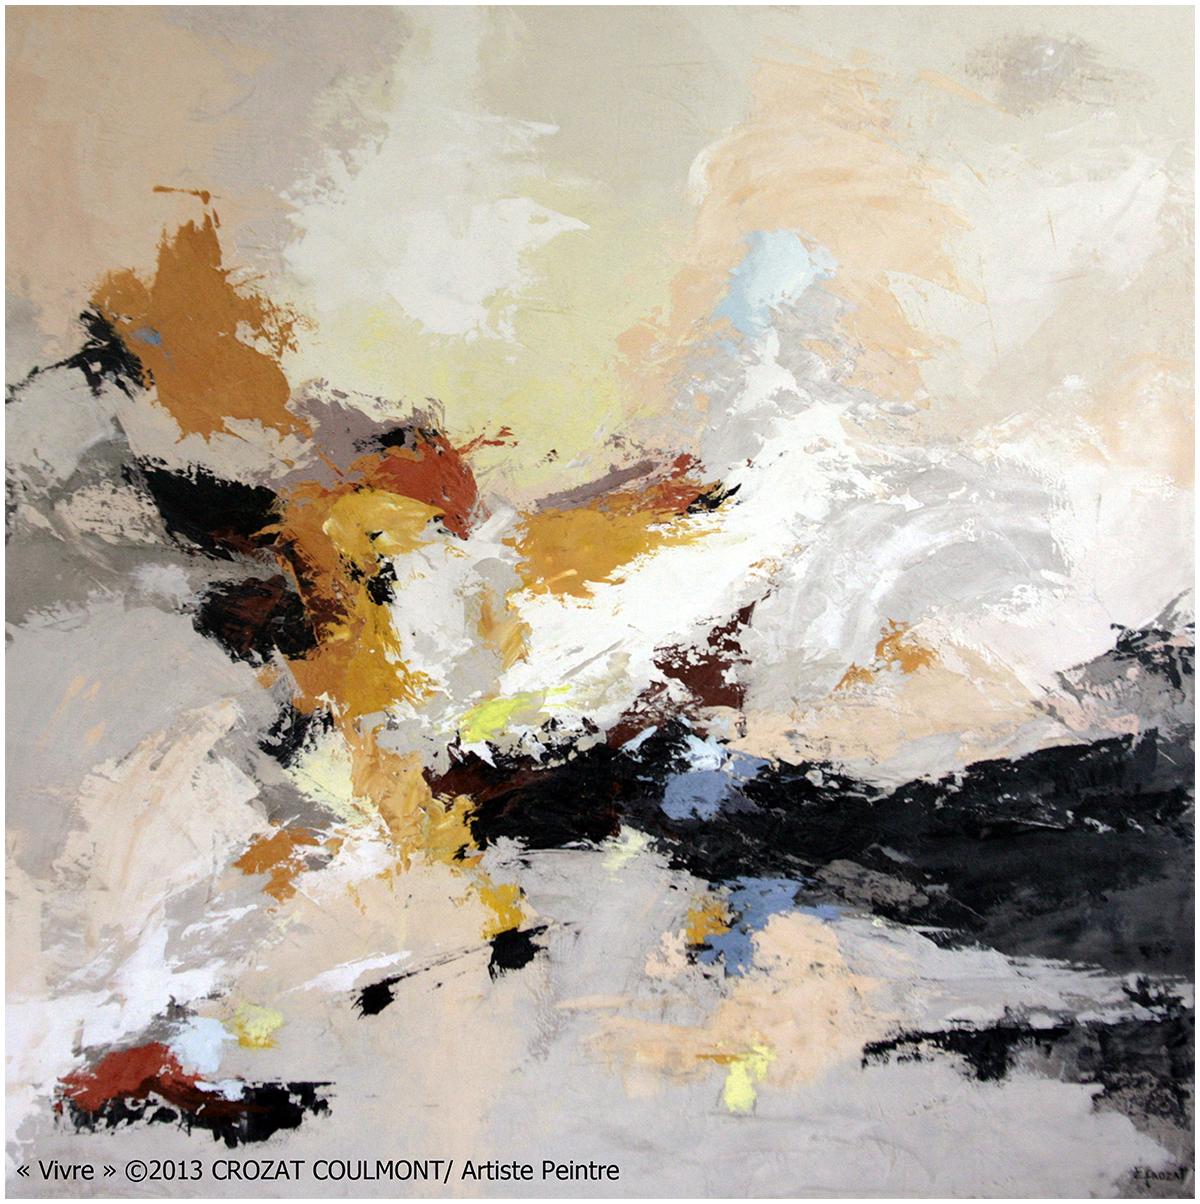 femme peintre   l u2019artiste peintre d u2019art abstrait crozat